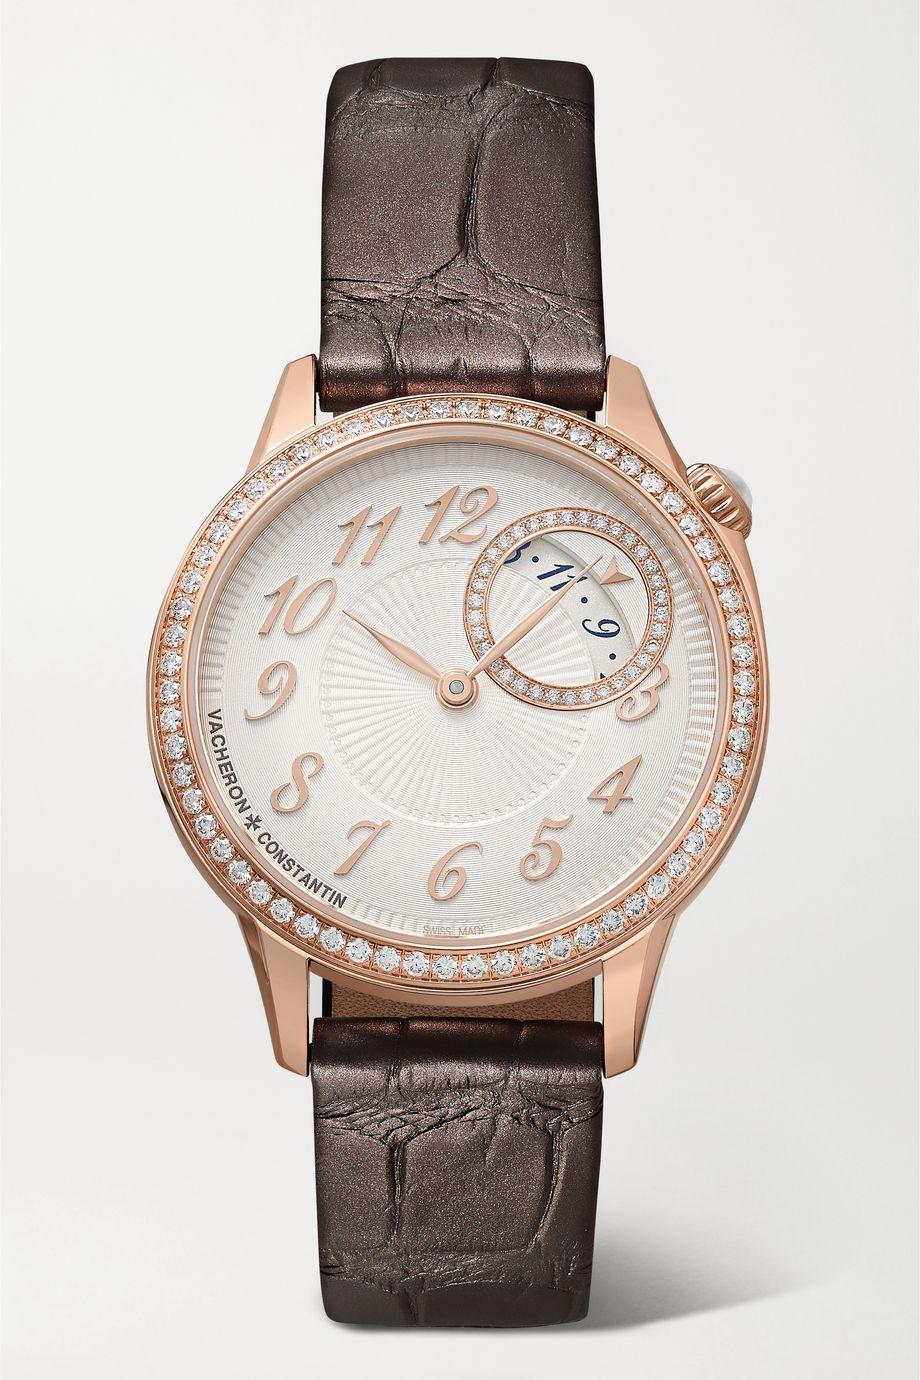 Vacheron Constantin Égérie 30mm 18-karat pink gold, alligator and diamond watch